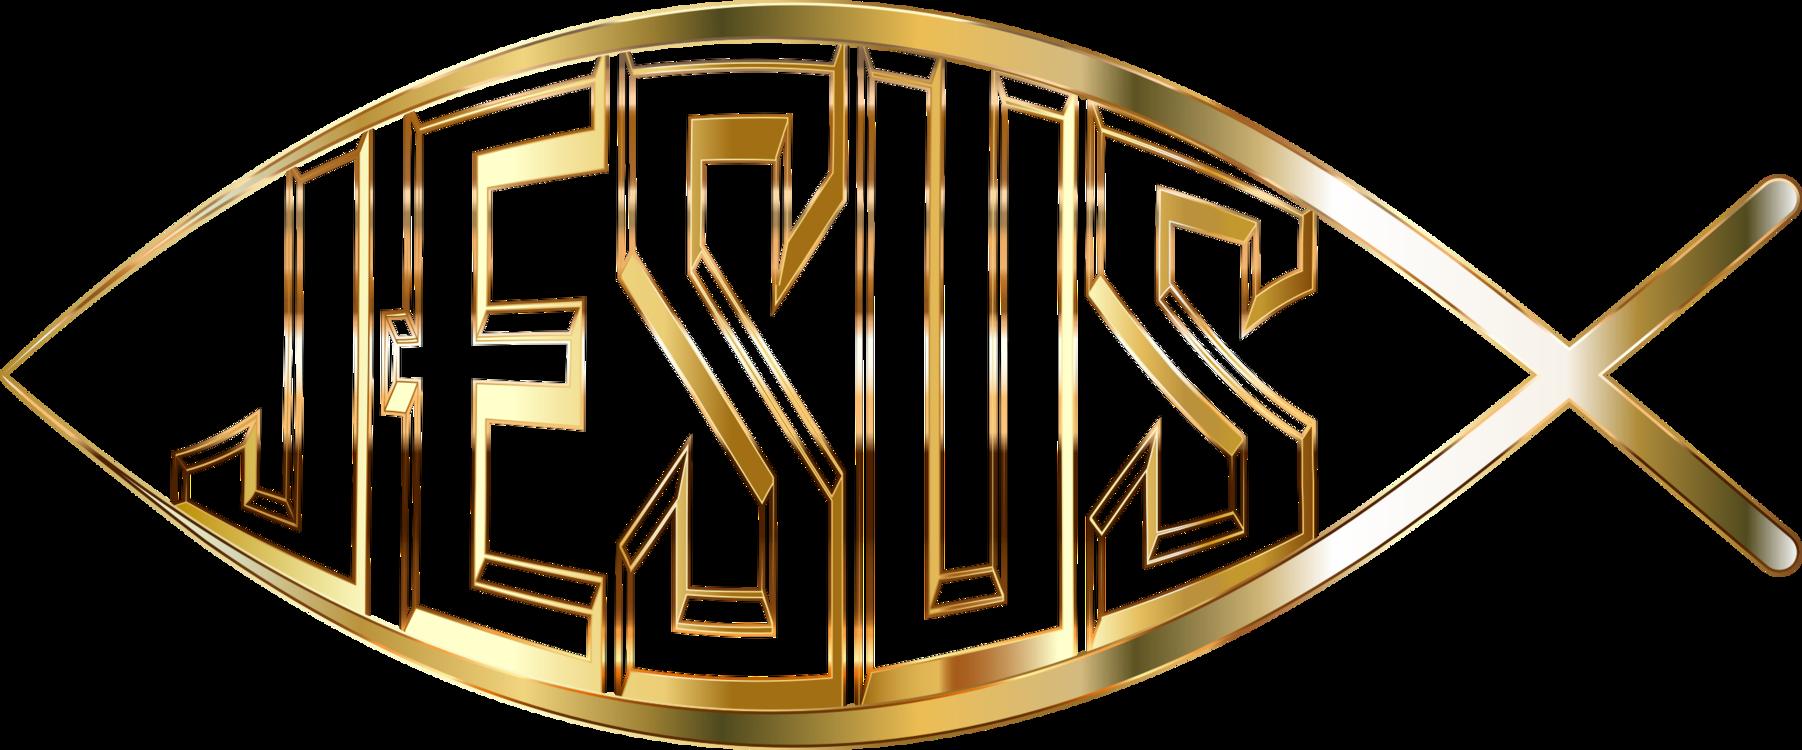 Angle,Gold,Symbol